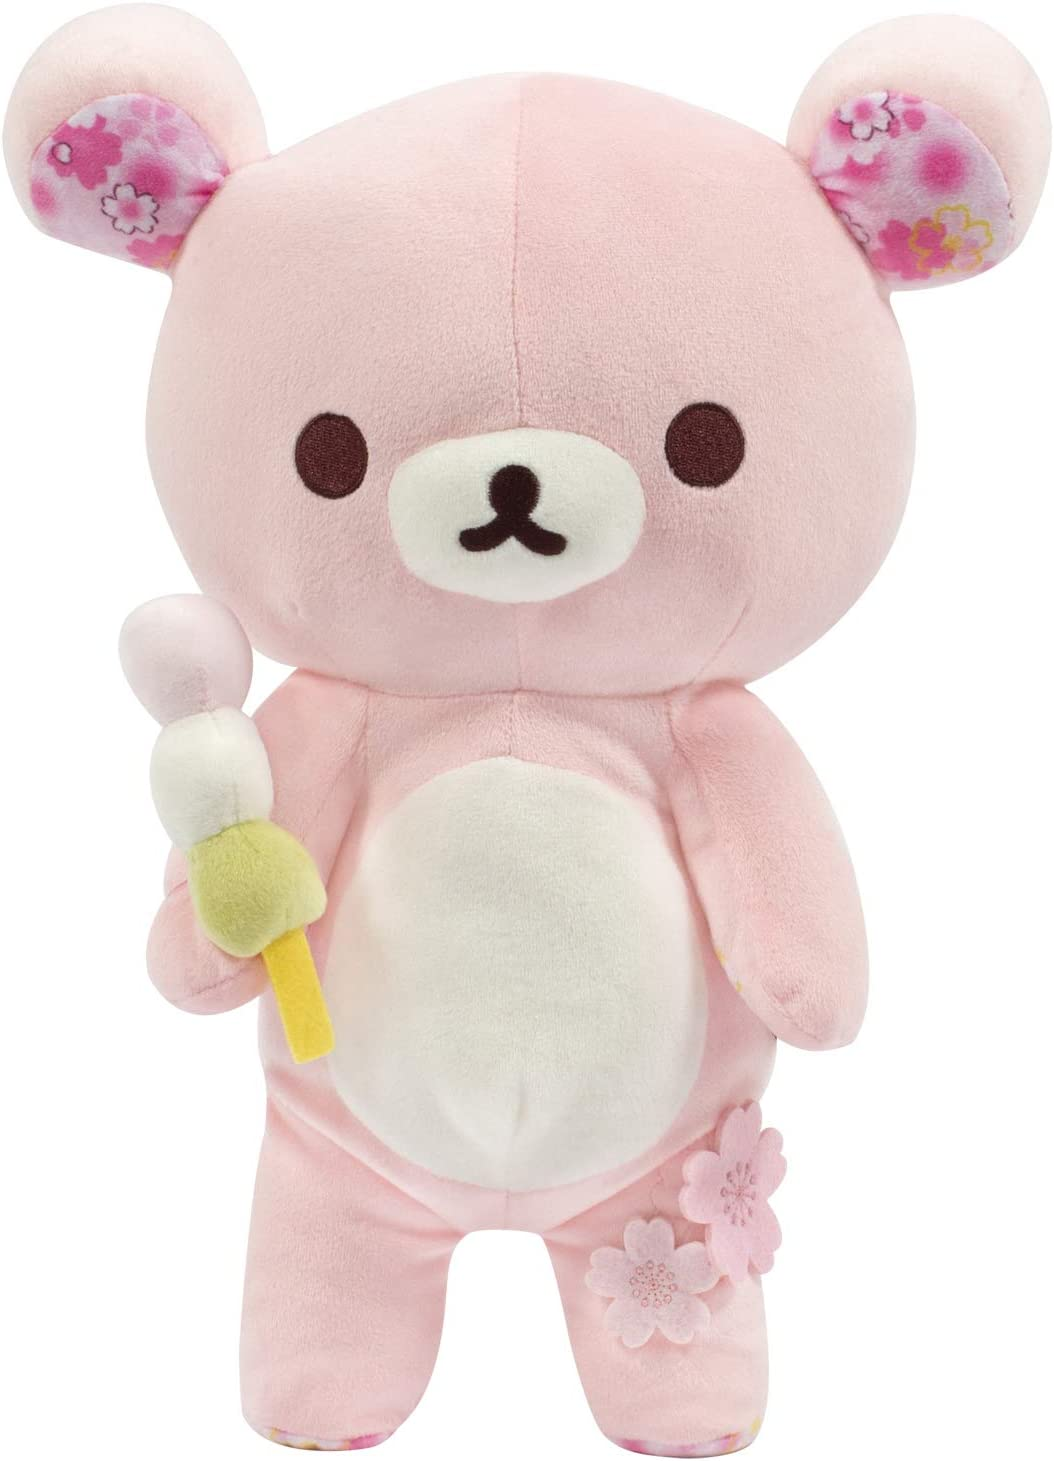 Rilakkuma Cherry Blossom Series Plush, Doll, Stuffed Animal, Authentic Licensed Product - 15